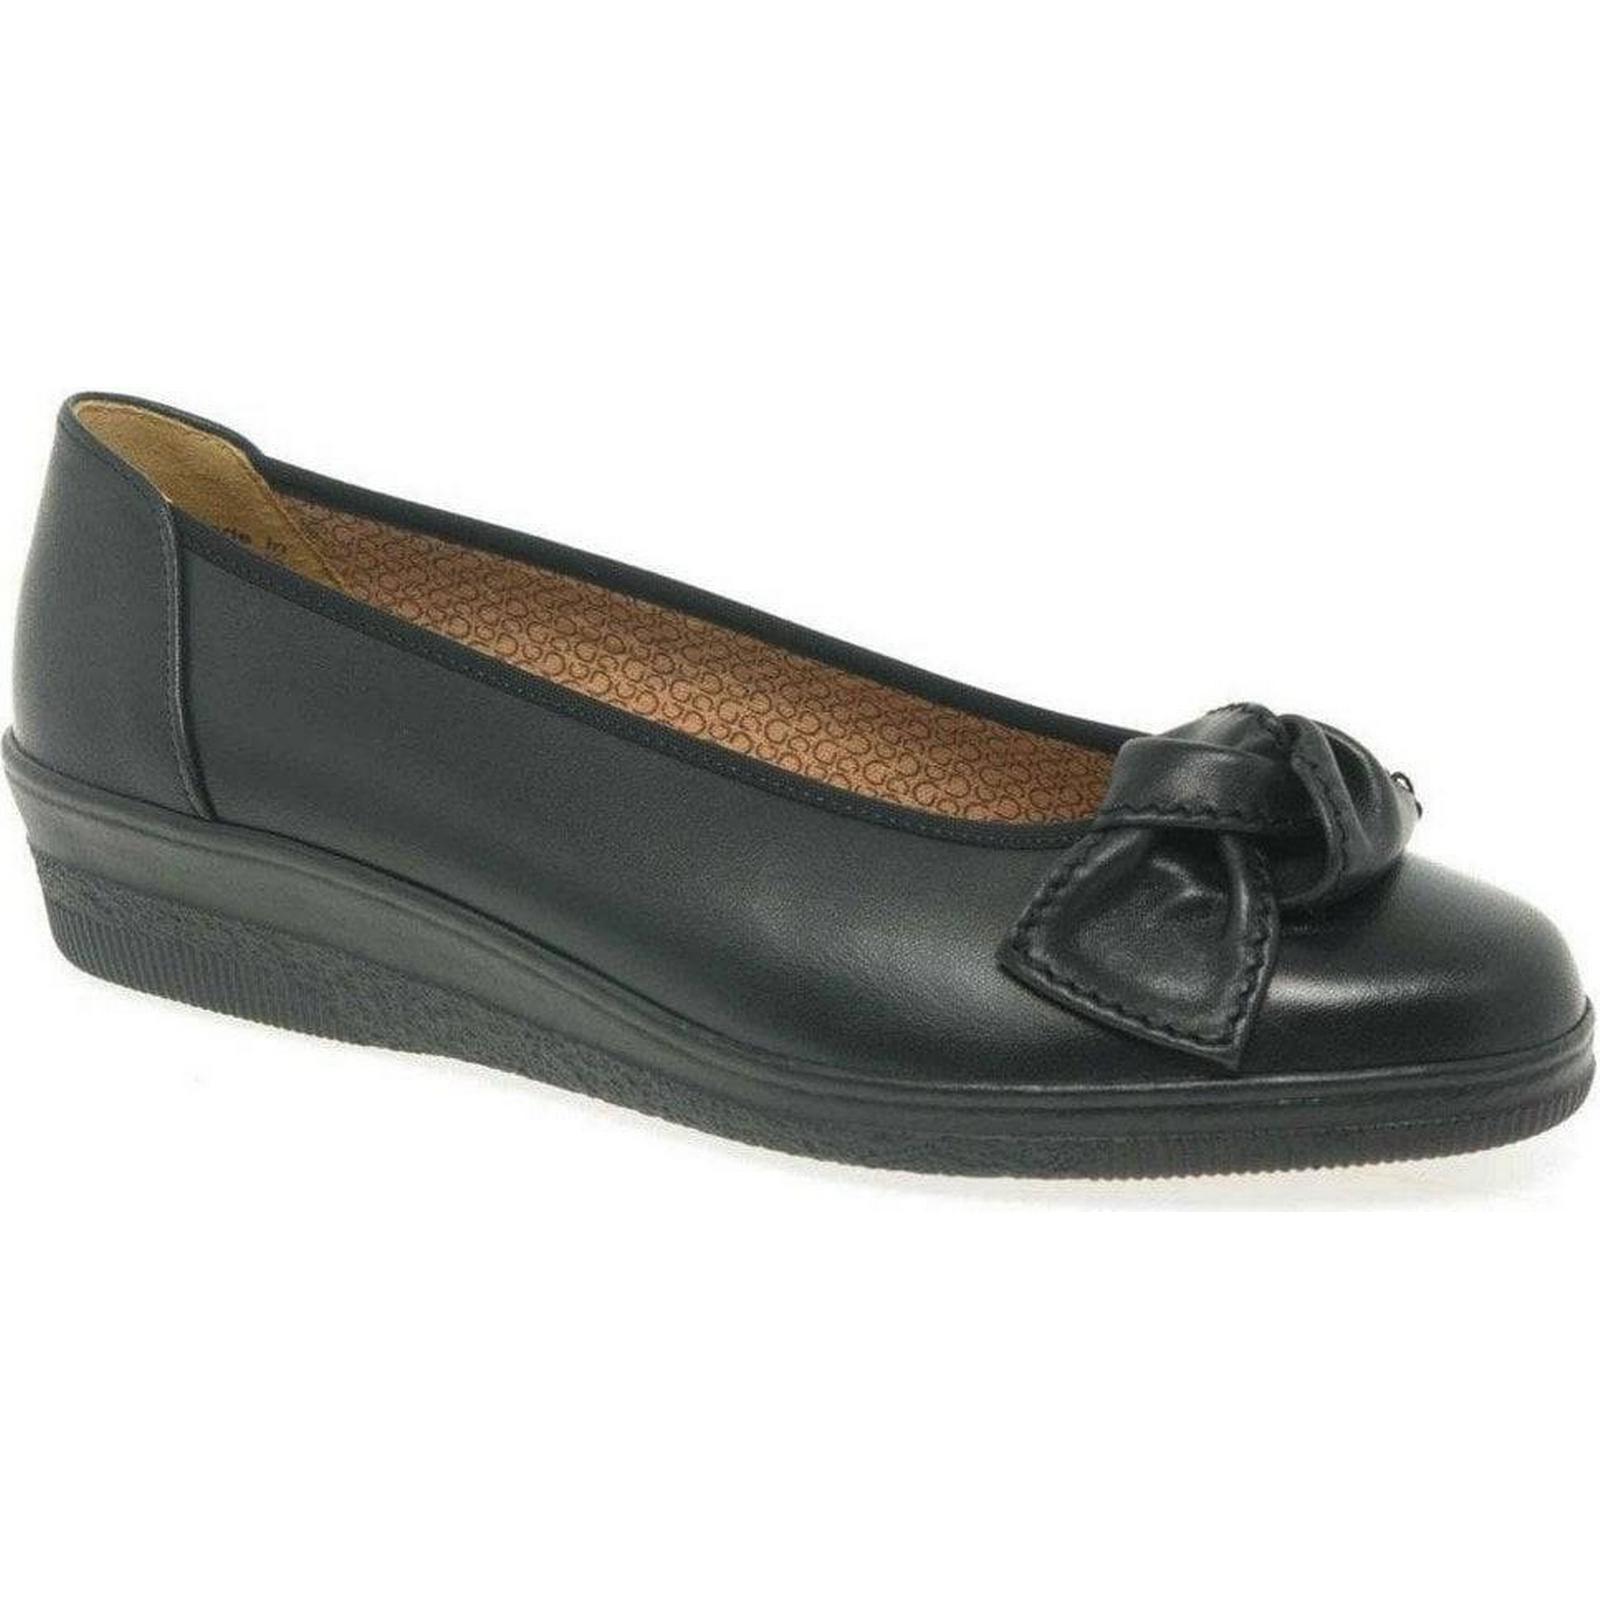 Gabor Colour: Lesley Womens Casual Shoes Colour: Gabor Black, Size: 3.5 6cfb62